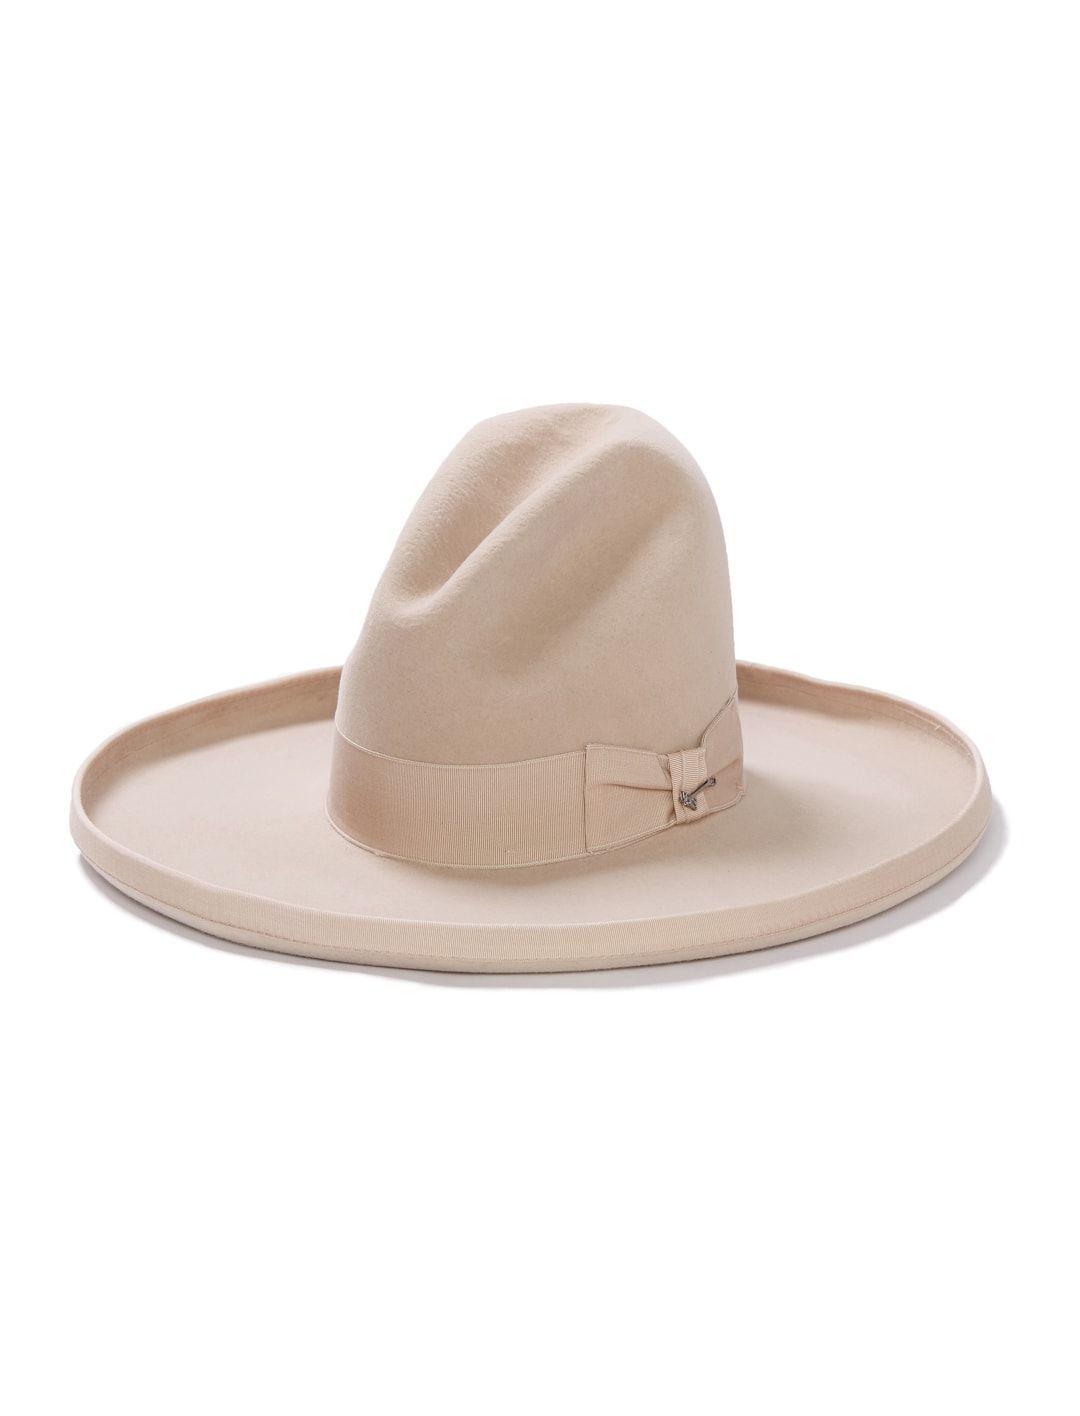 e1d48c8e5129a Stetson Tom Mix 6X Cowboy Hat